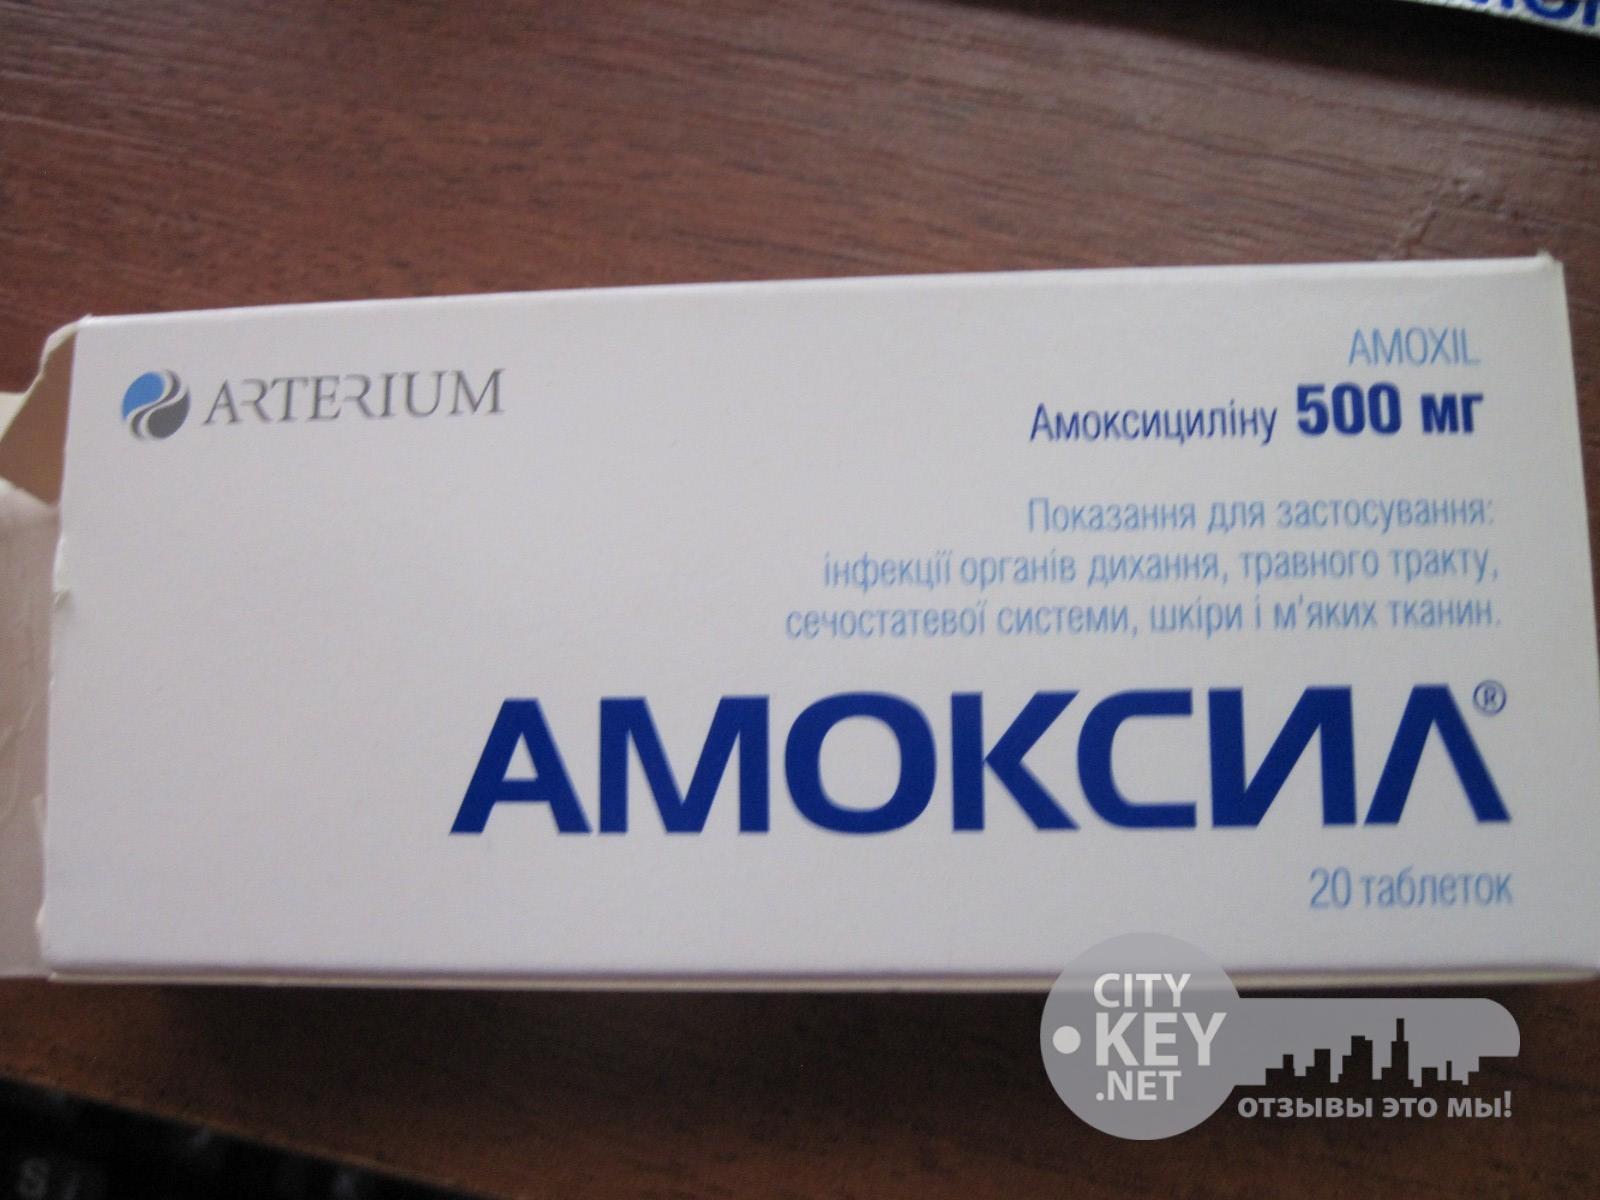 Амоксил-к 625, корпорация артериум